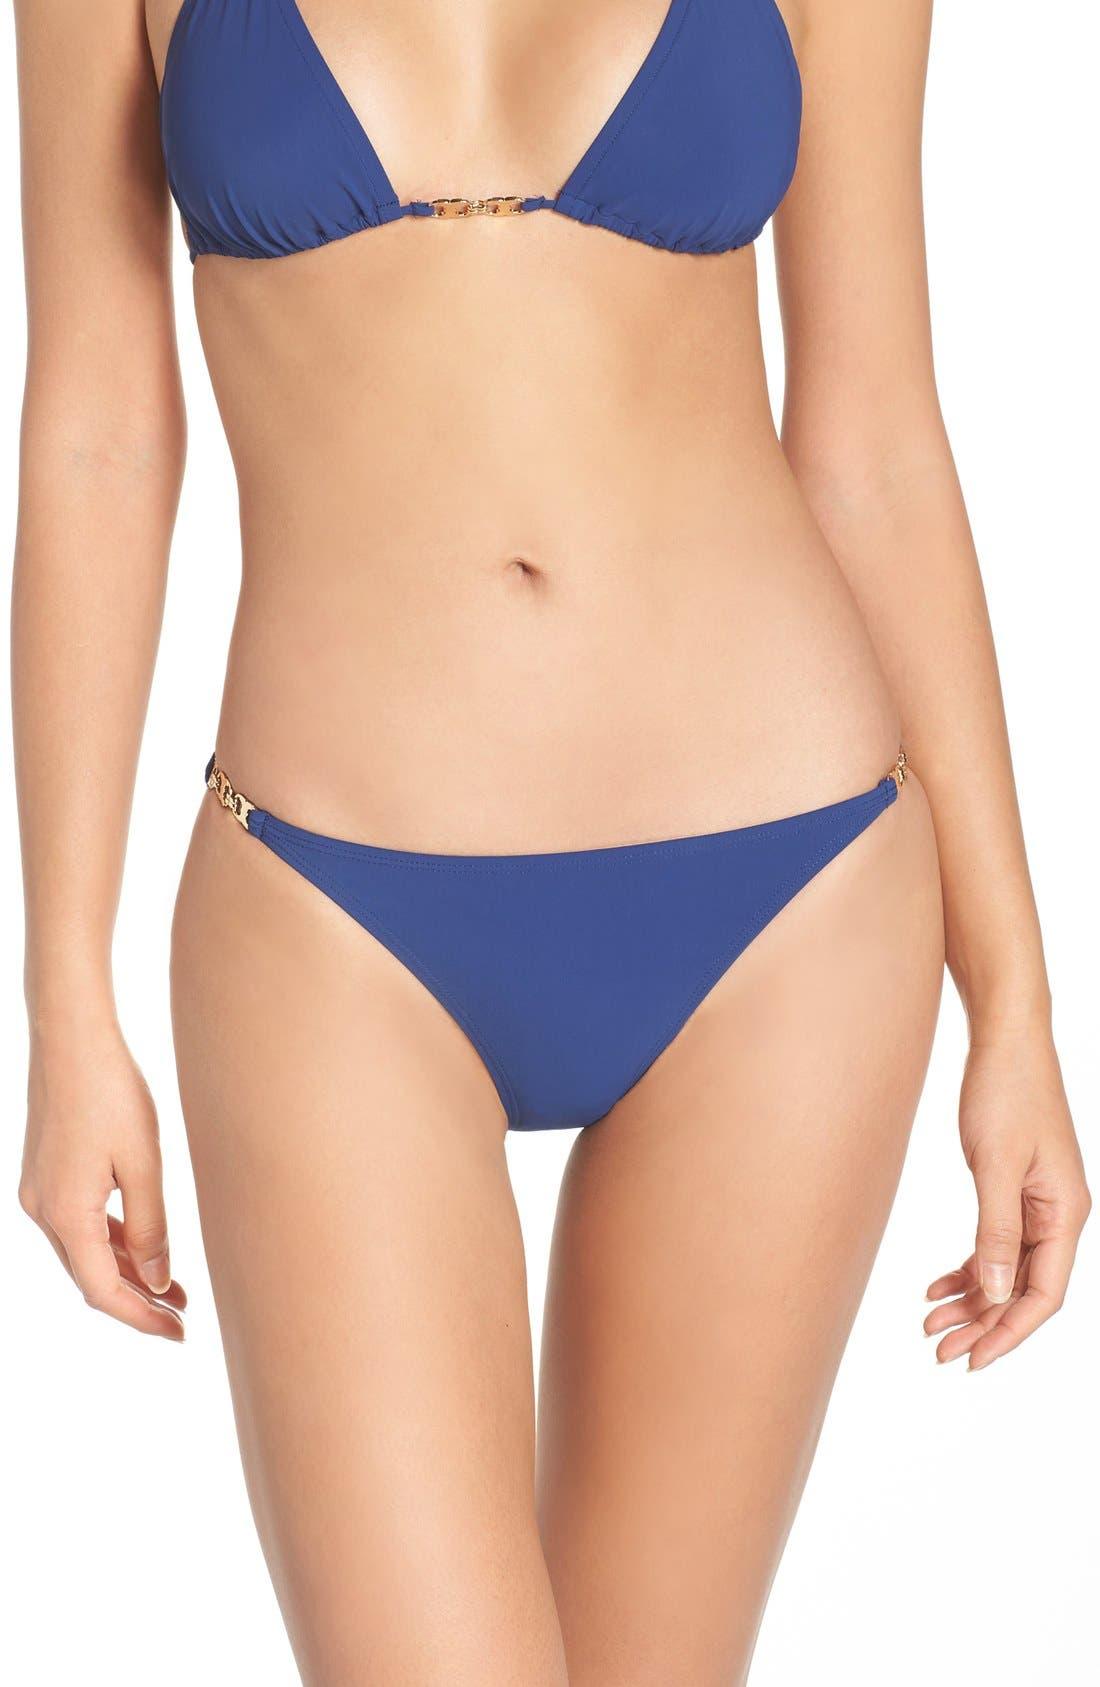 Gemini Link Bikini Bottoms,                         Main,                         color, Capri Blue